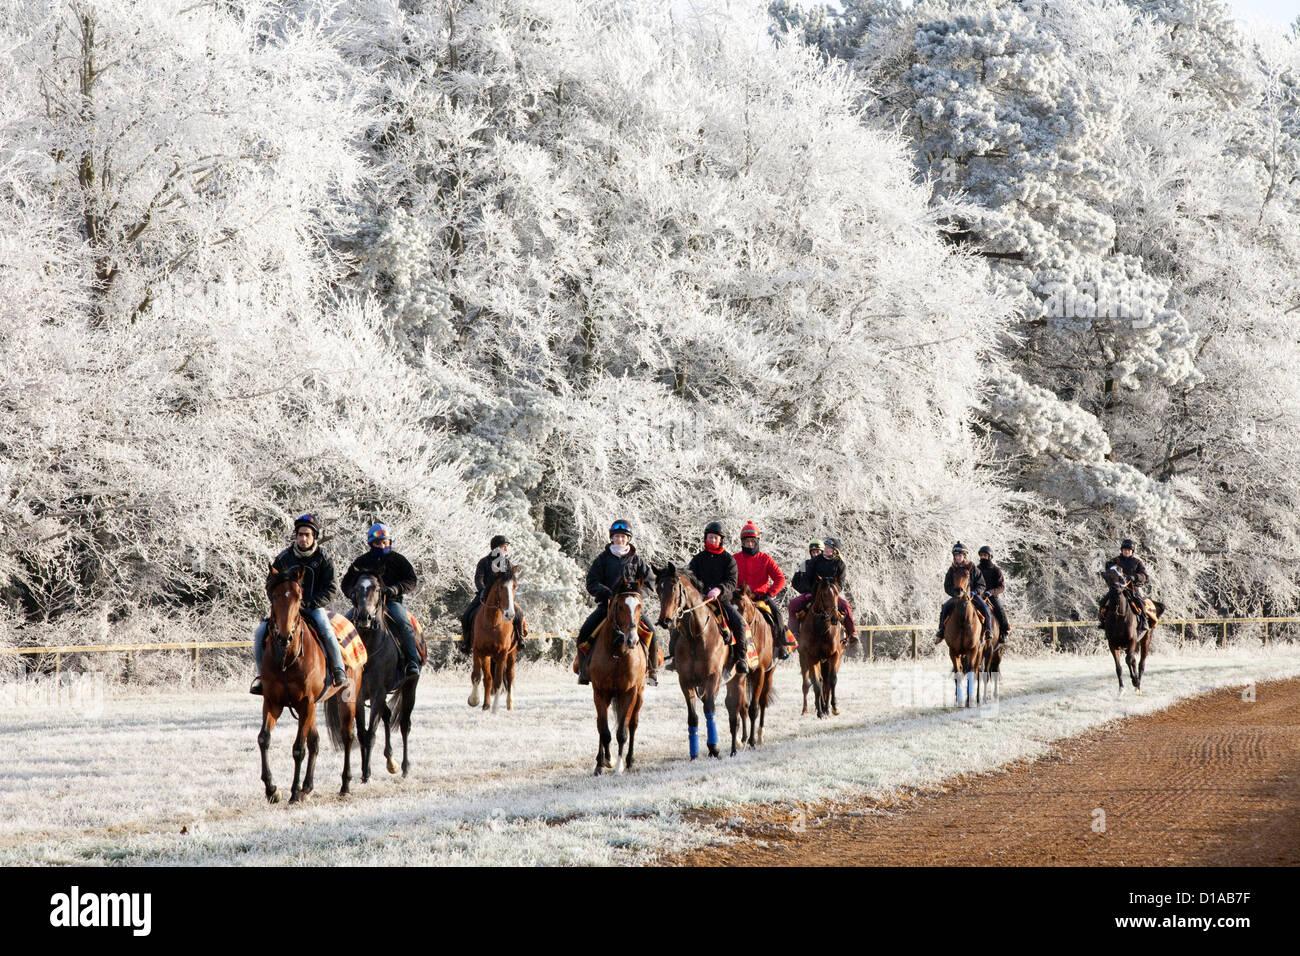 Horses_and_jockeys_riding_on_a_frosty_wi